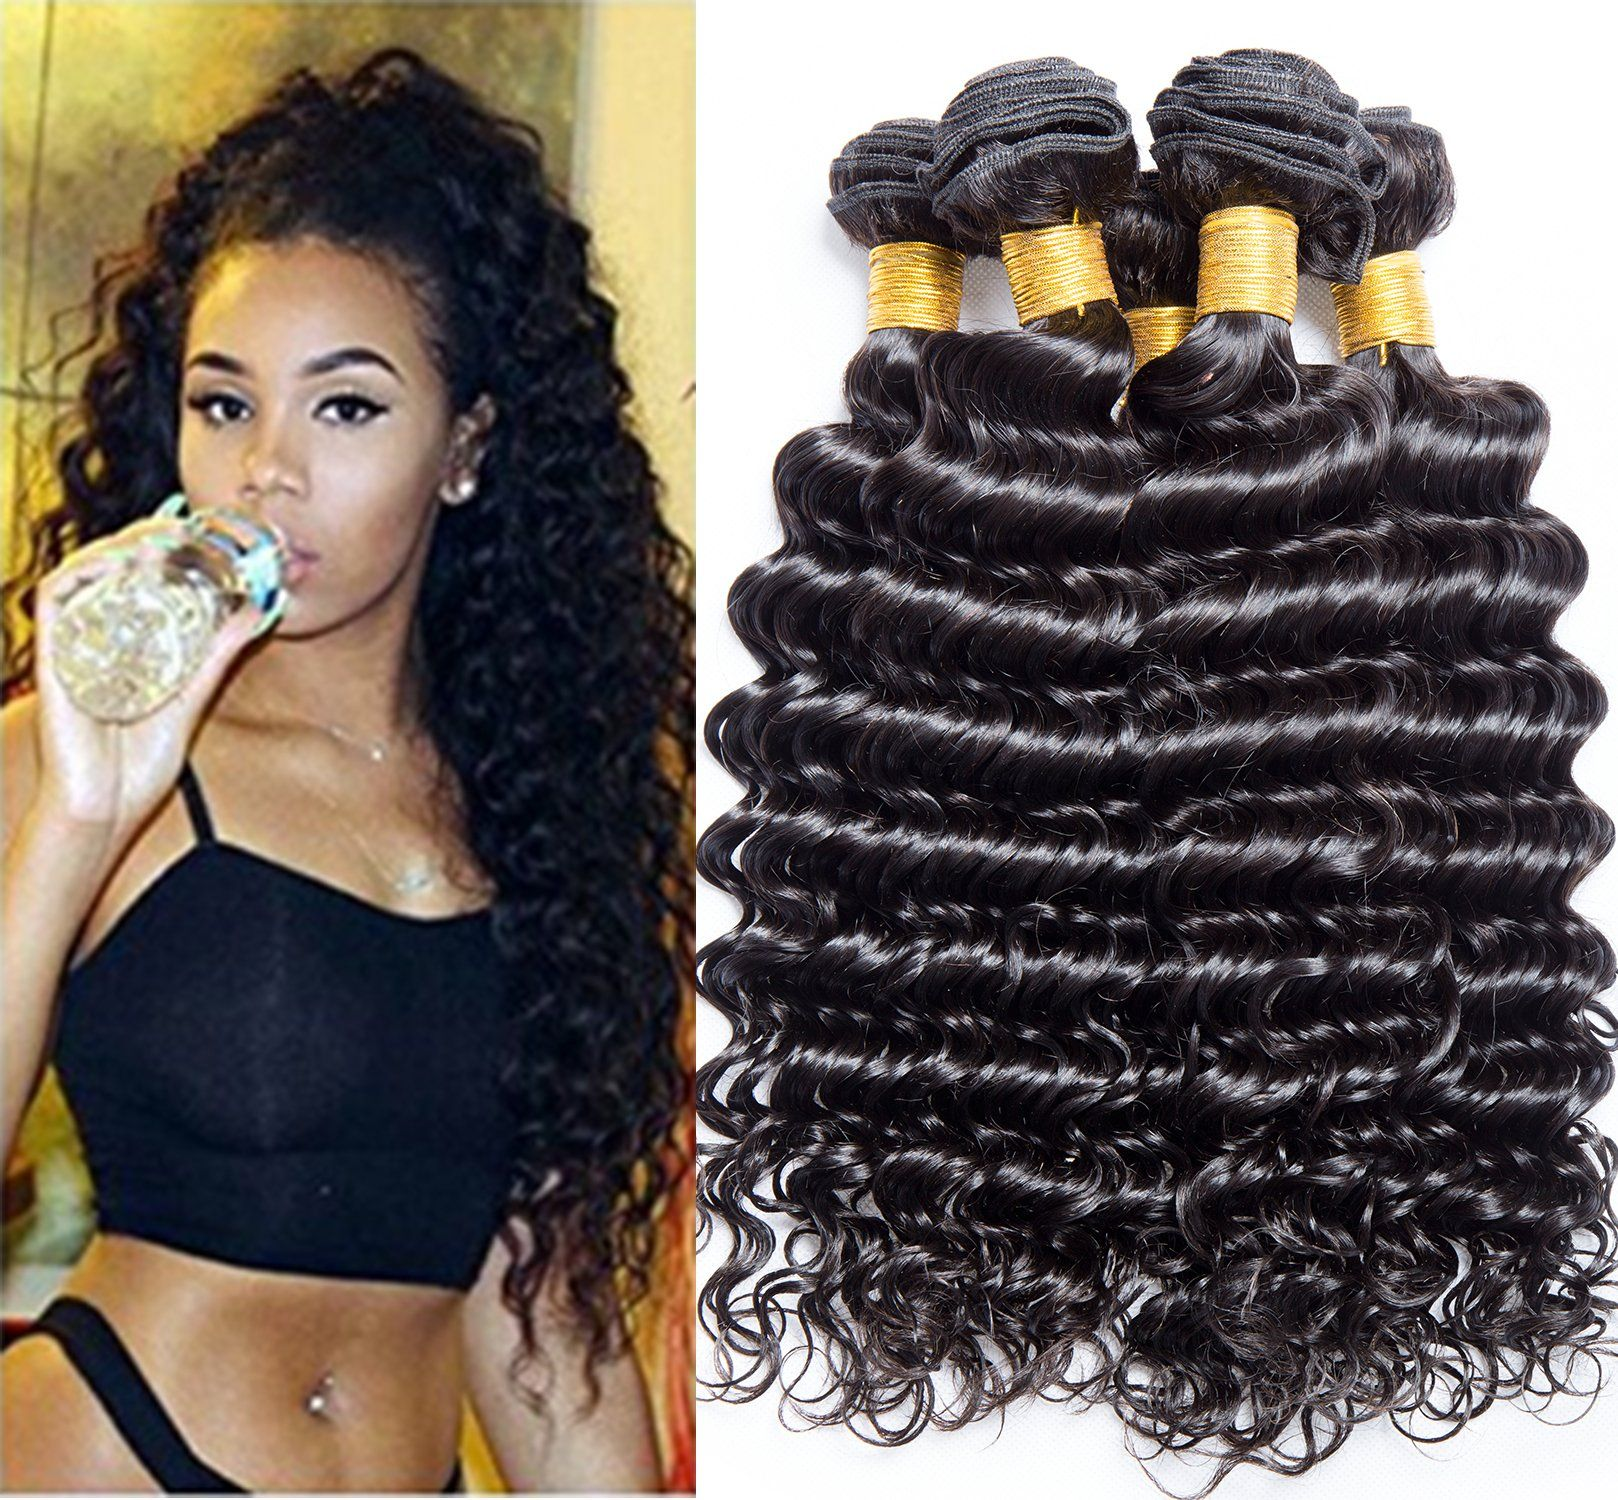 Vipbeauty Hair 8a Grade Good Quality Brazilian Curly Hair Weave 3